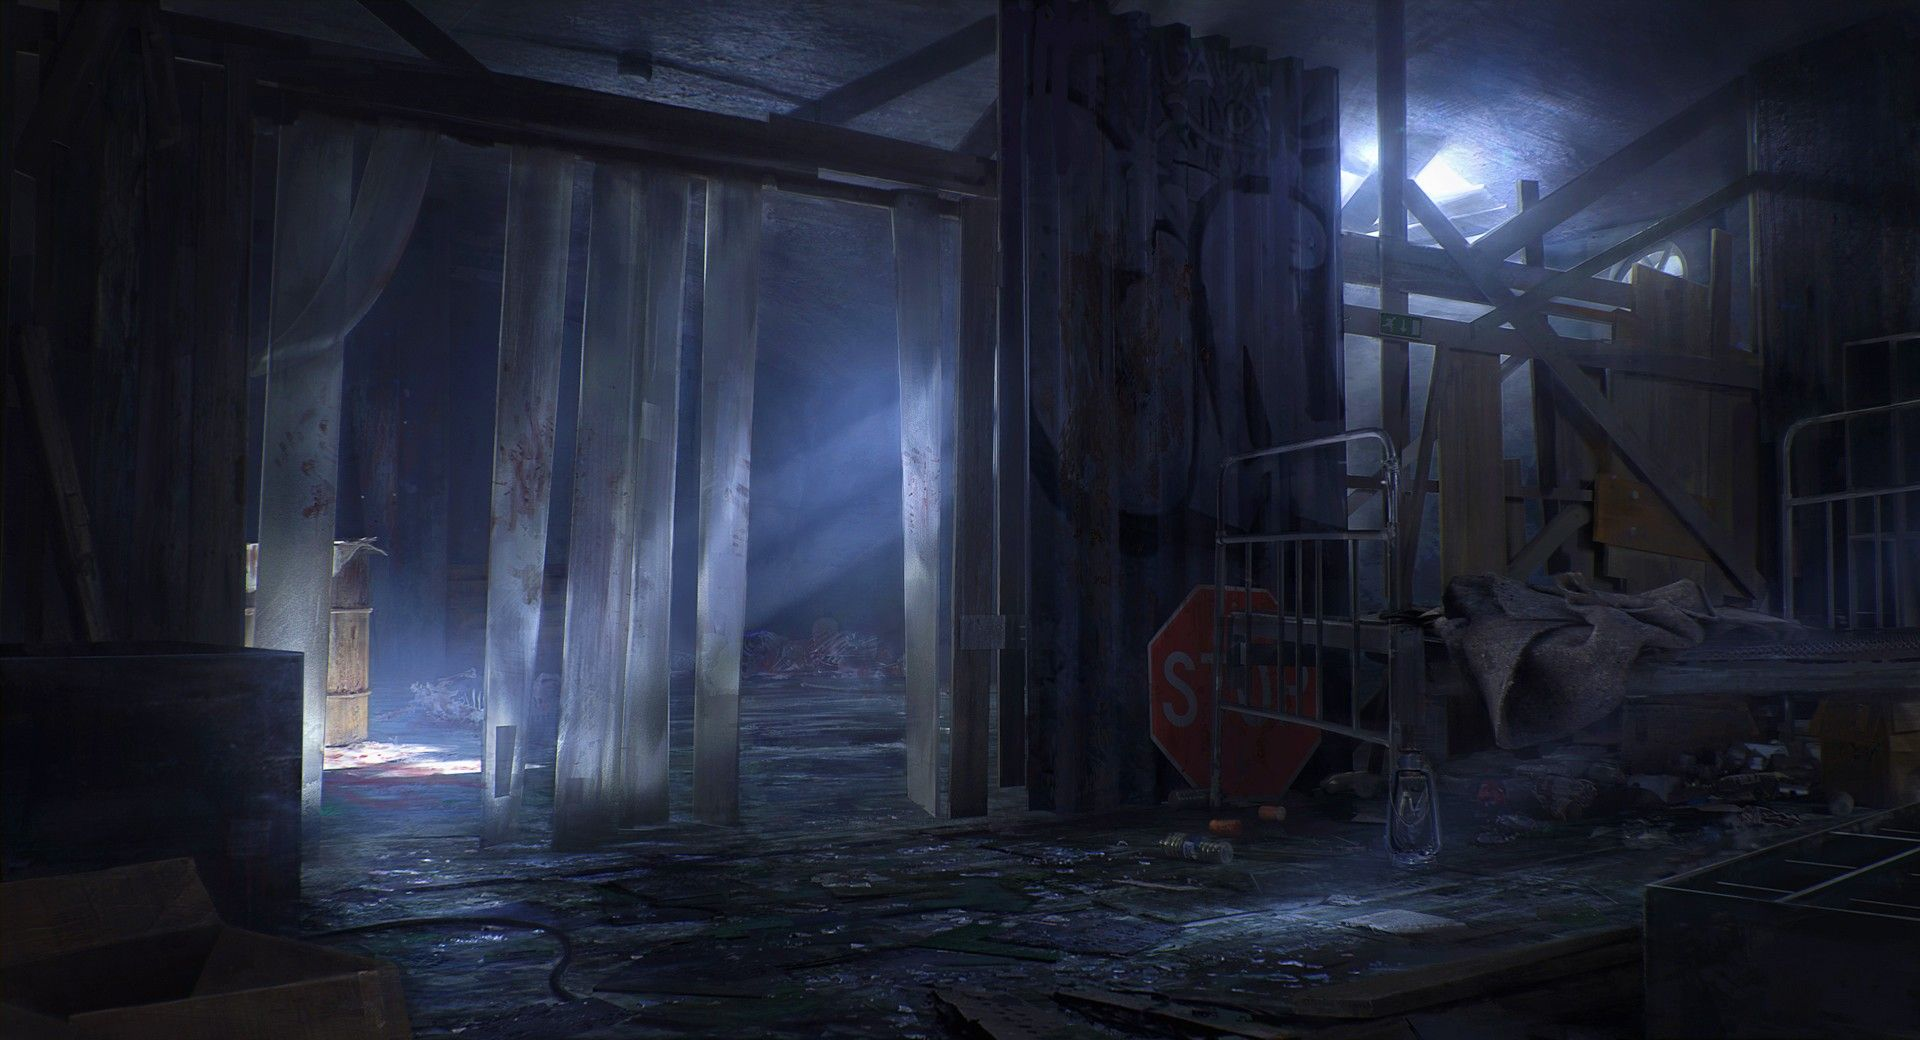 Dark Anime Bedroom Background Dark Anime Anime Scenery